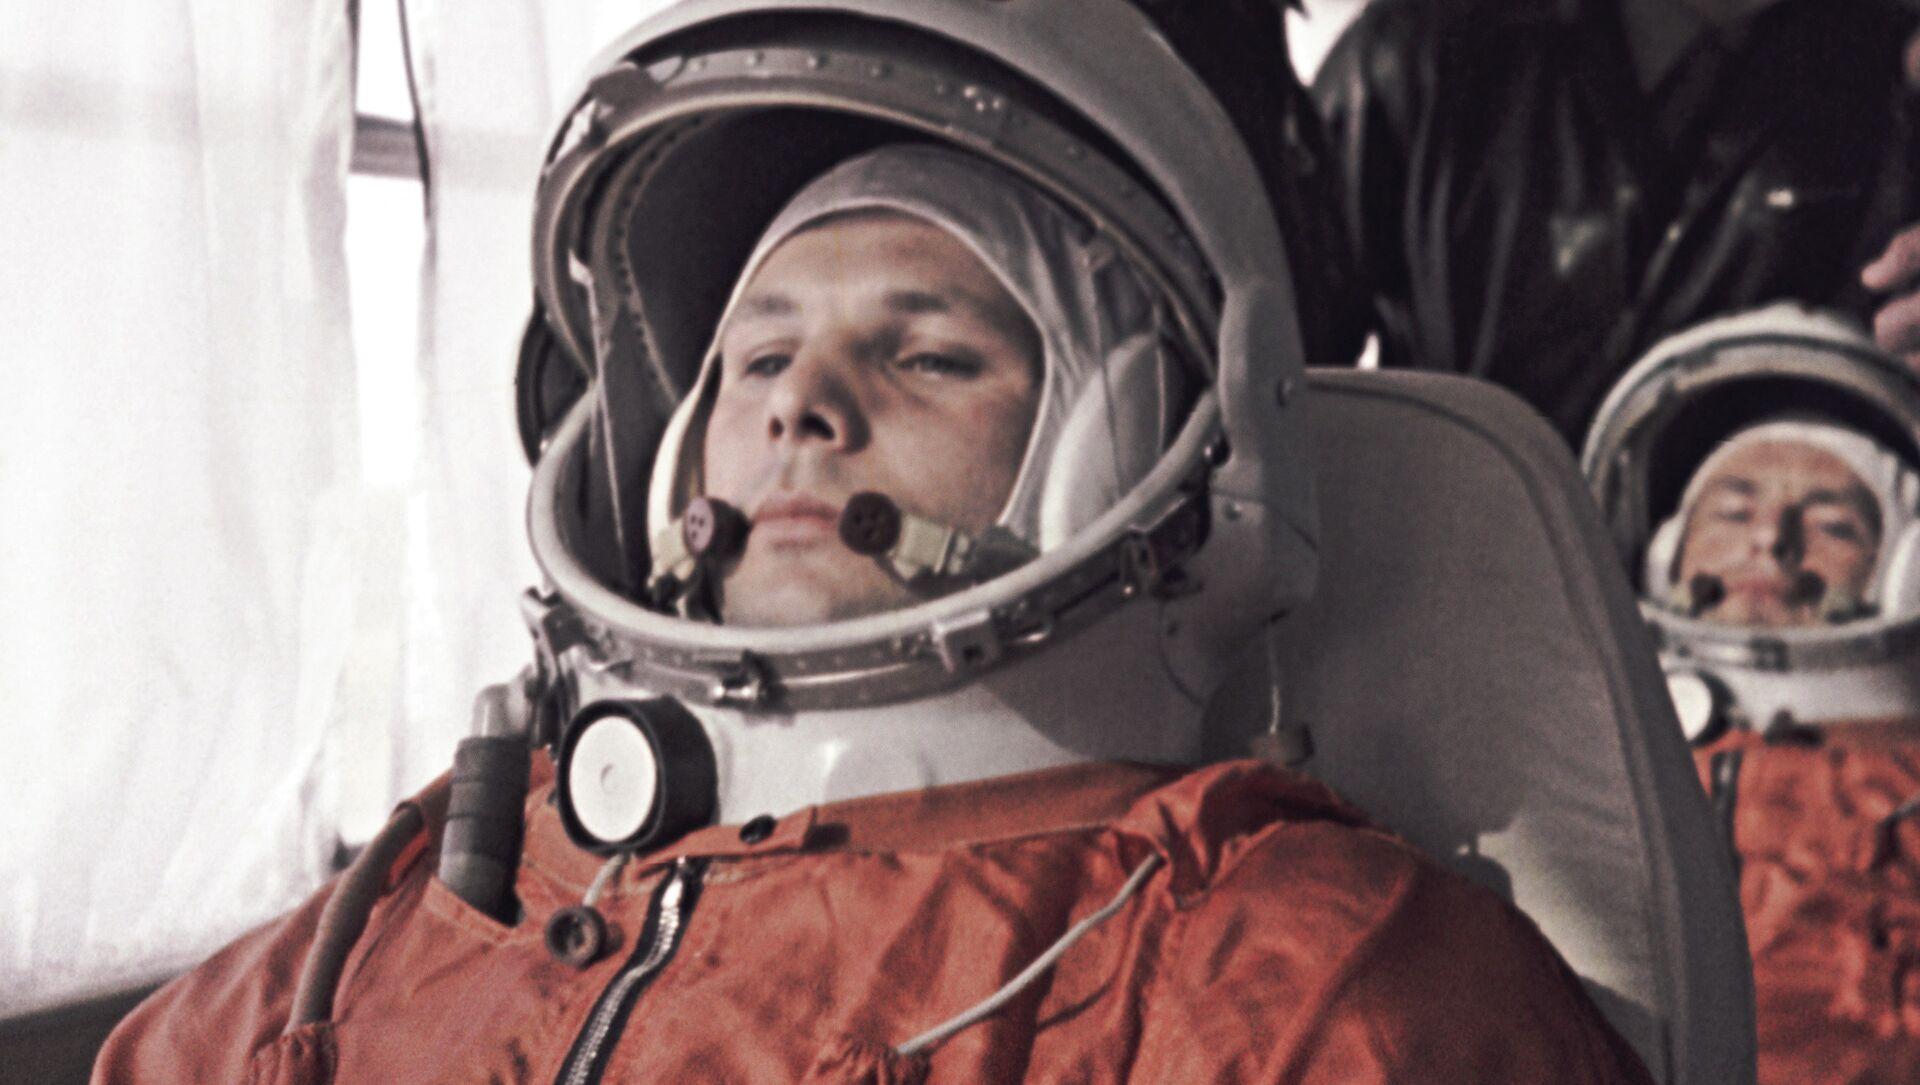 Юрий Гагарин - Sputnik Latvija, 1920, 12.04.2021